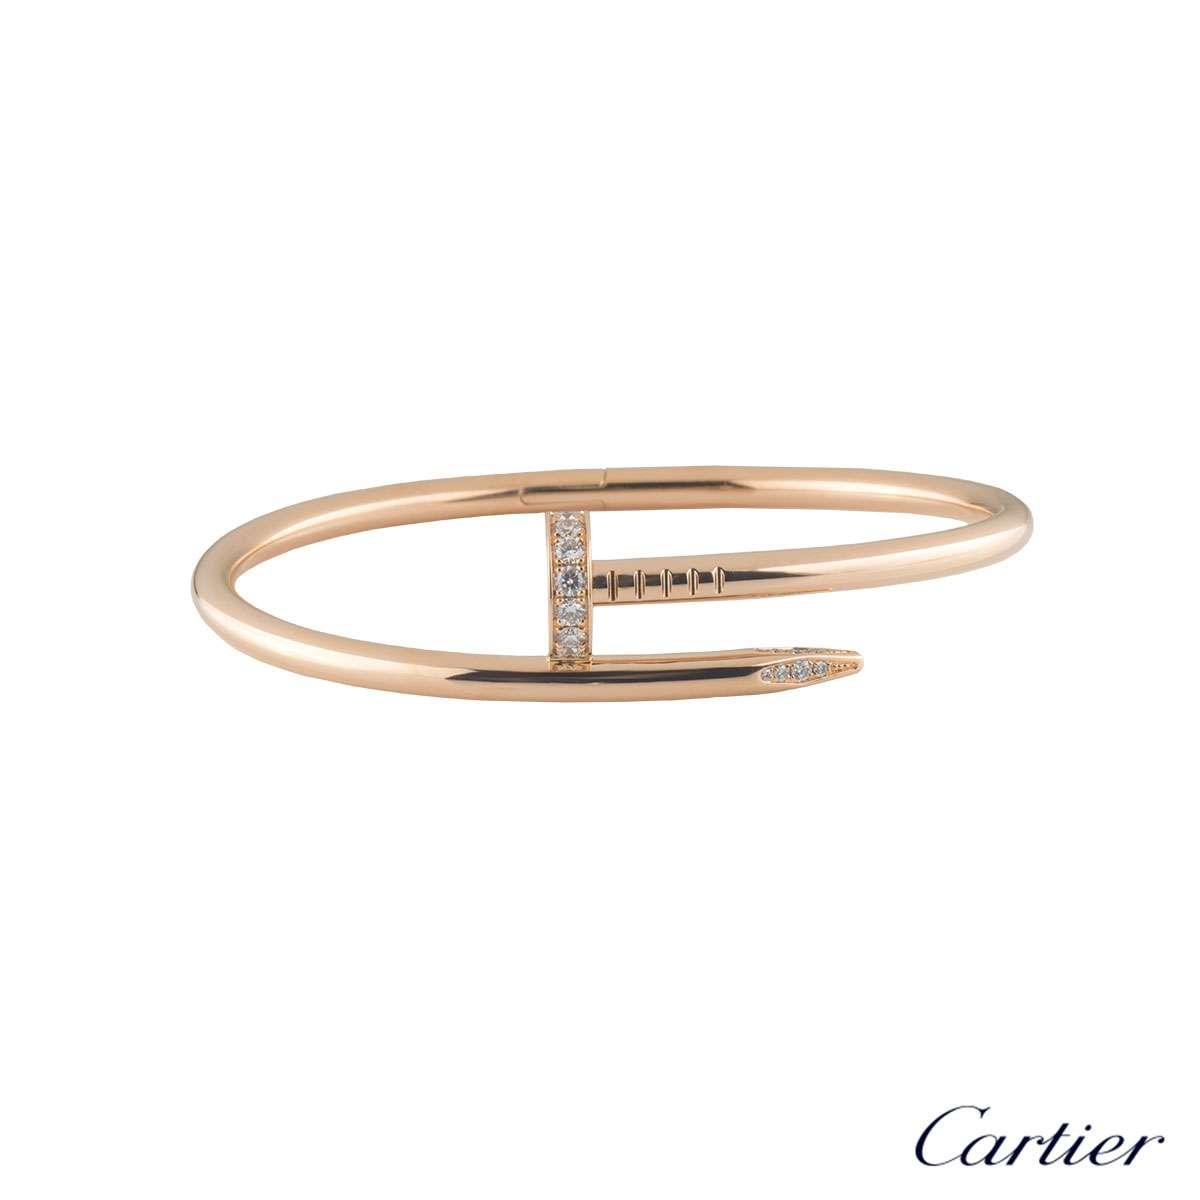 Cartier Rose Gold Diamond Juste Un Clou Bracelet Size 18 B6048518